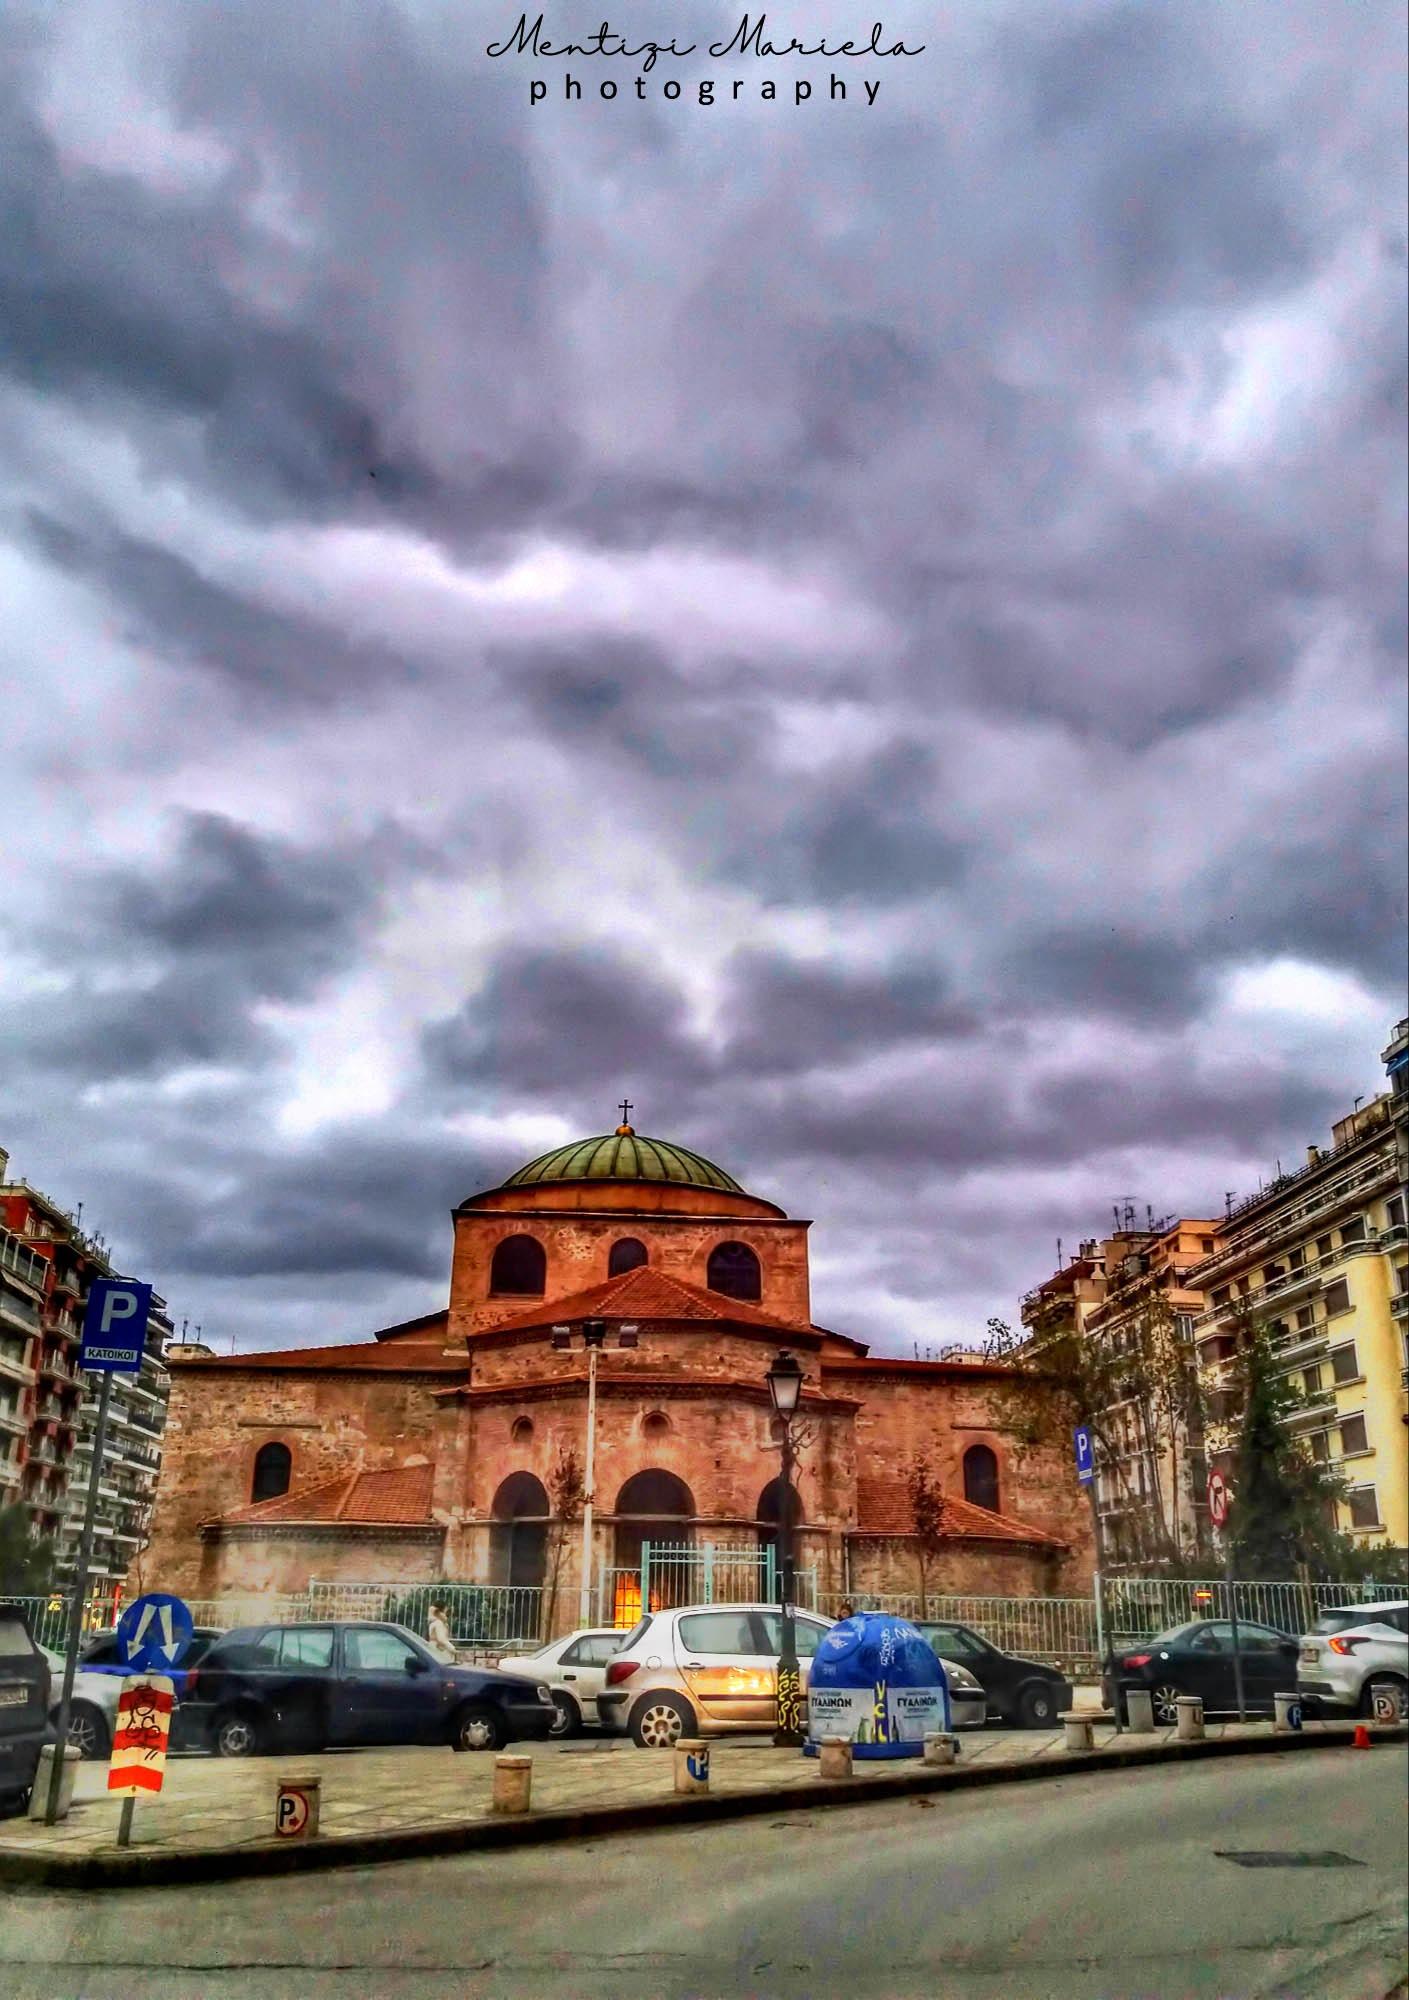 Agia Sofia, thessaloniki, Greece  by Mariela Mentizi